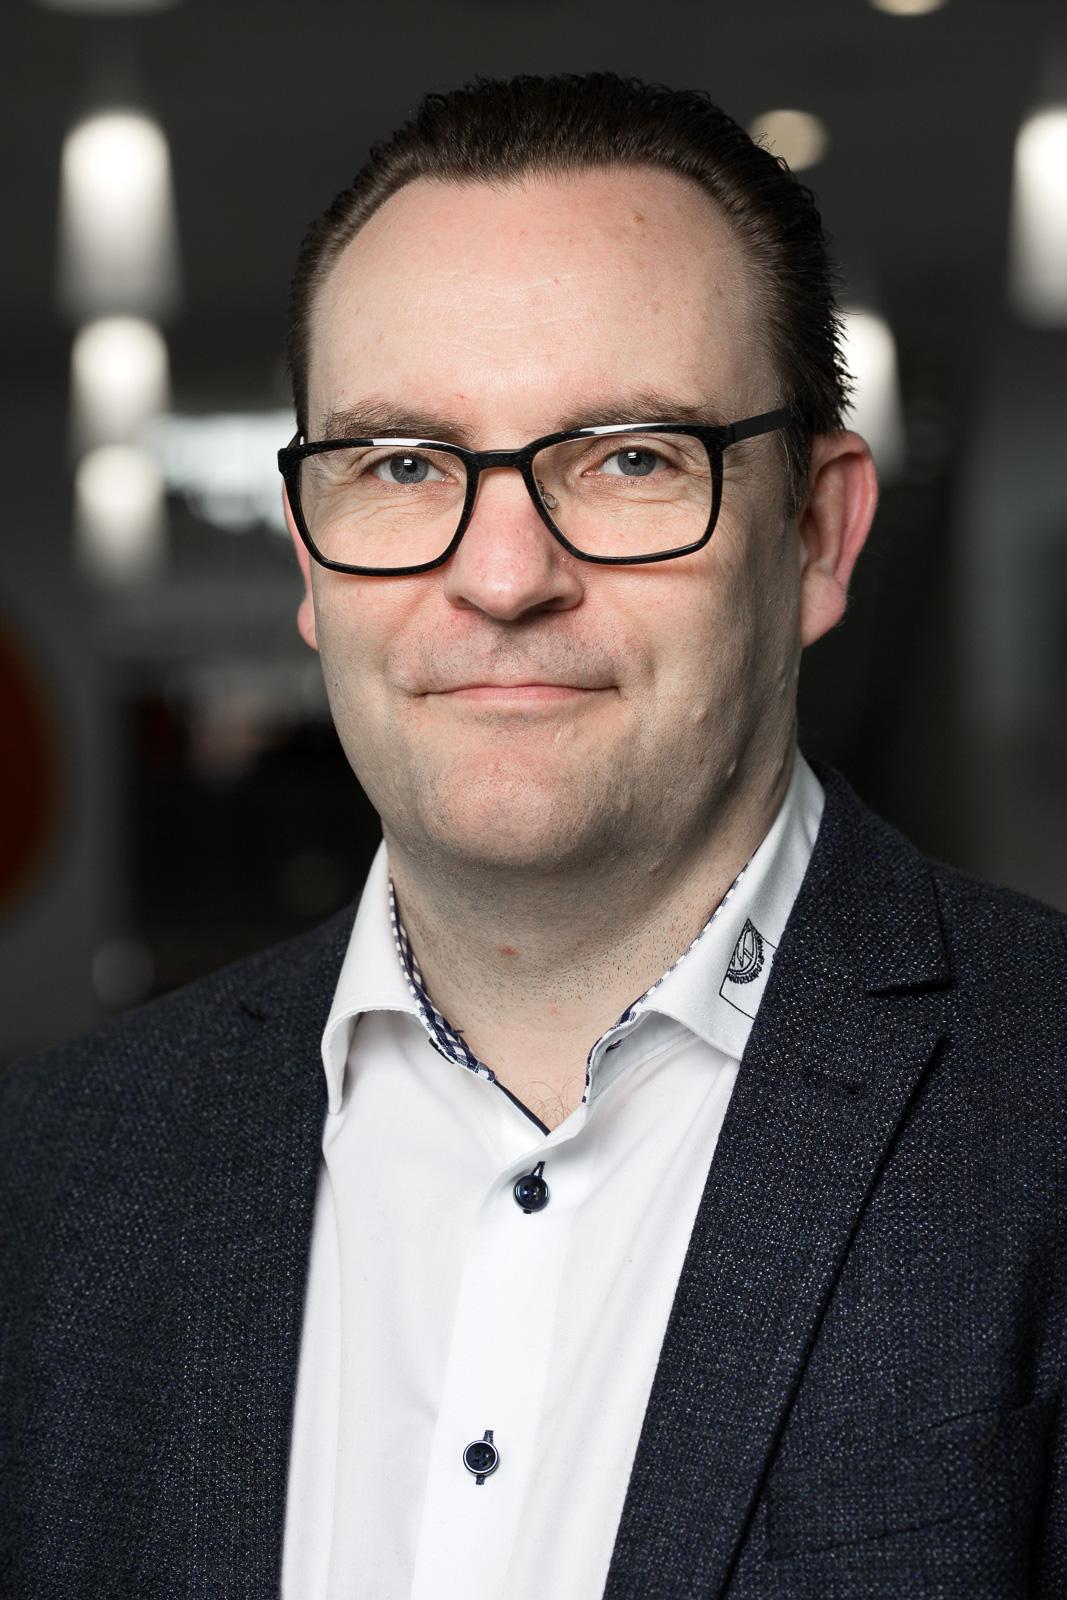 Jacob Kjær Eskildsen